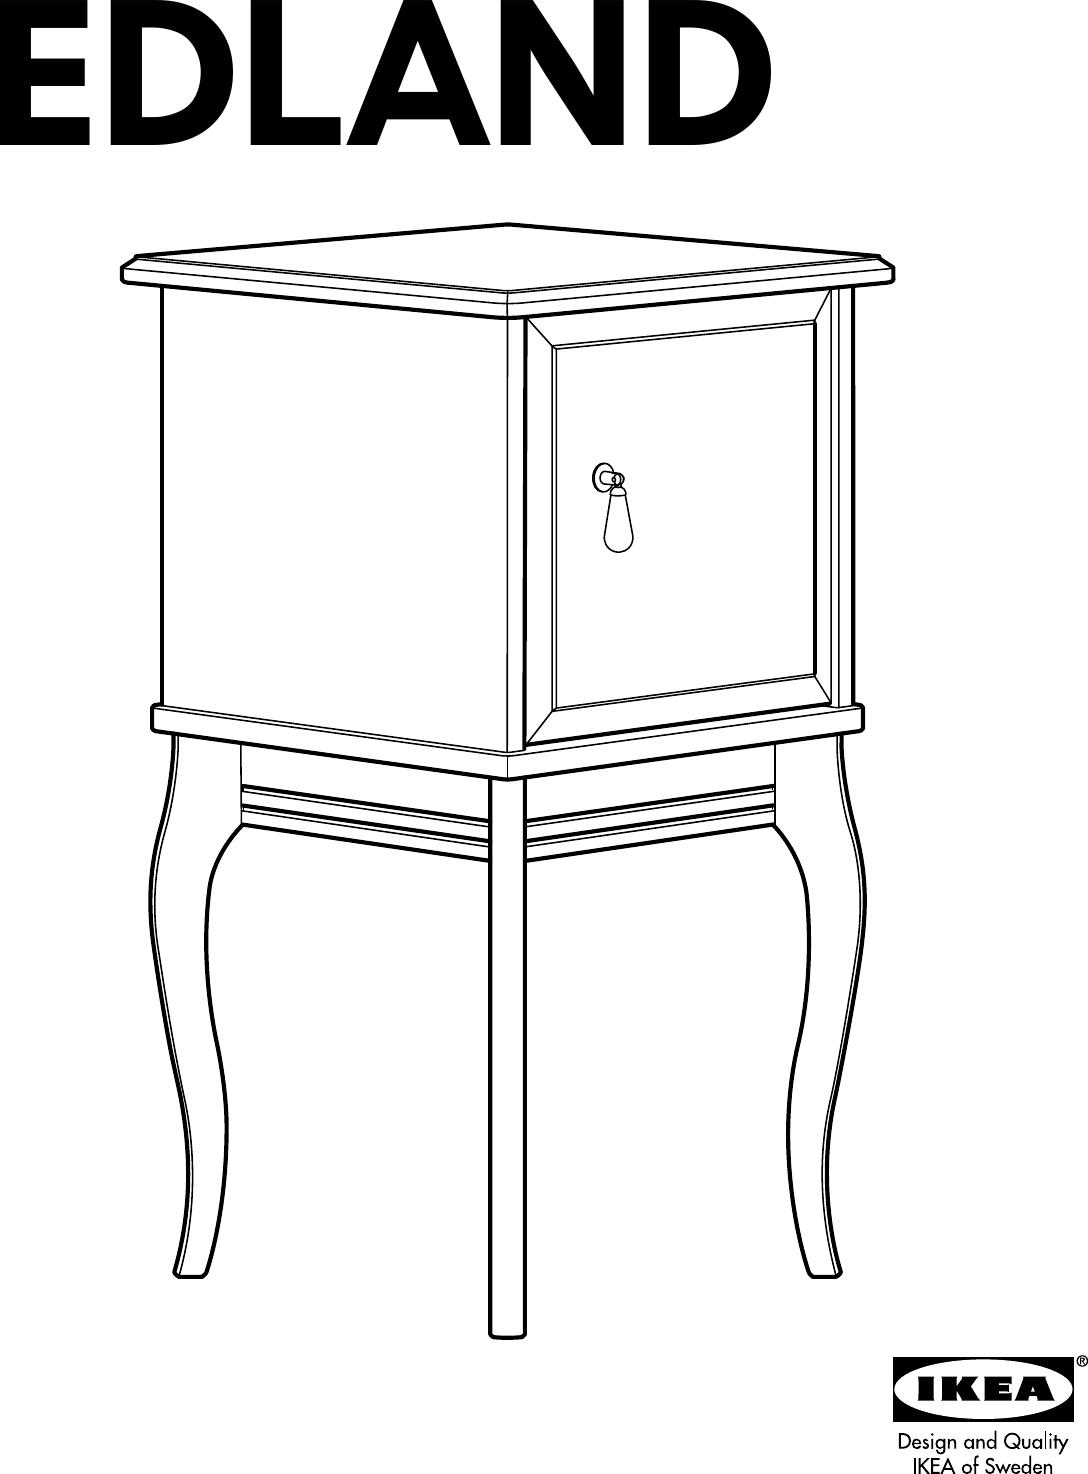 Ikea Edland Bedside Table Assembly Instruction